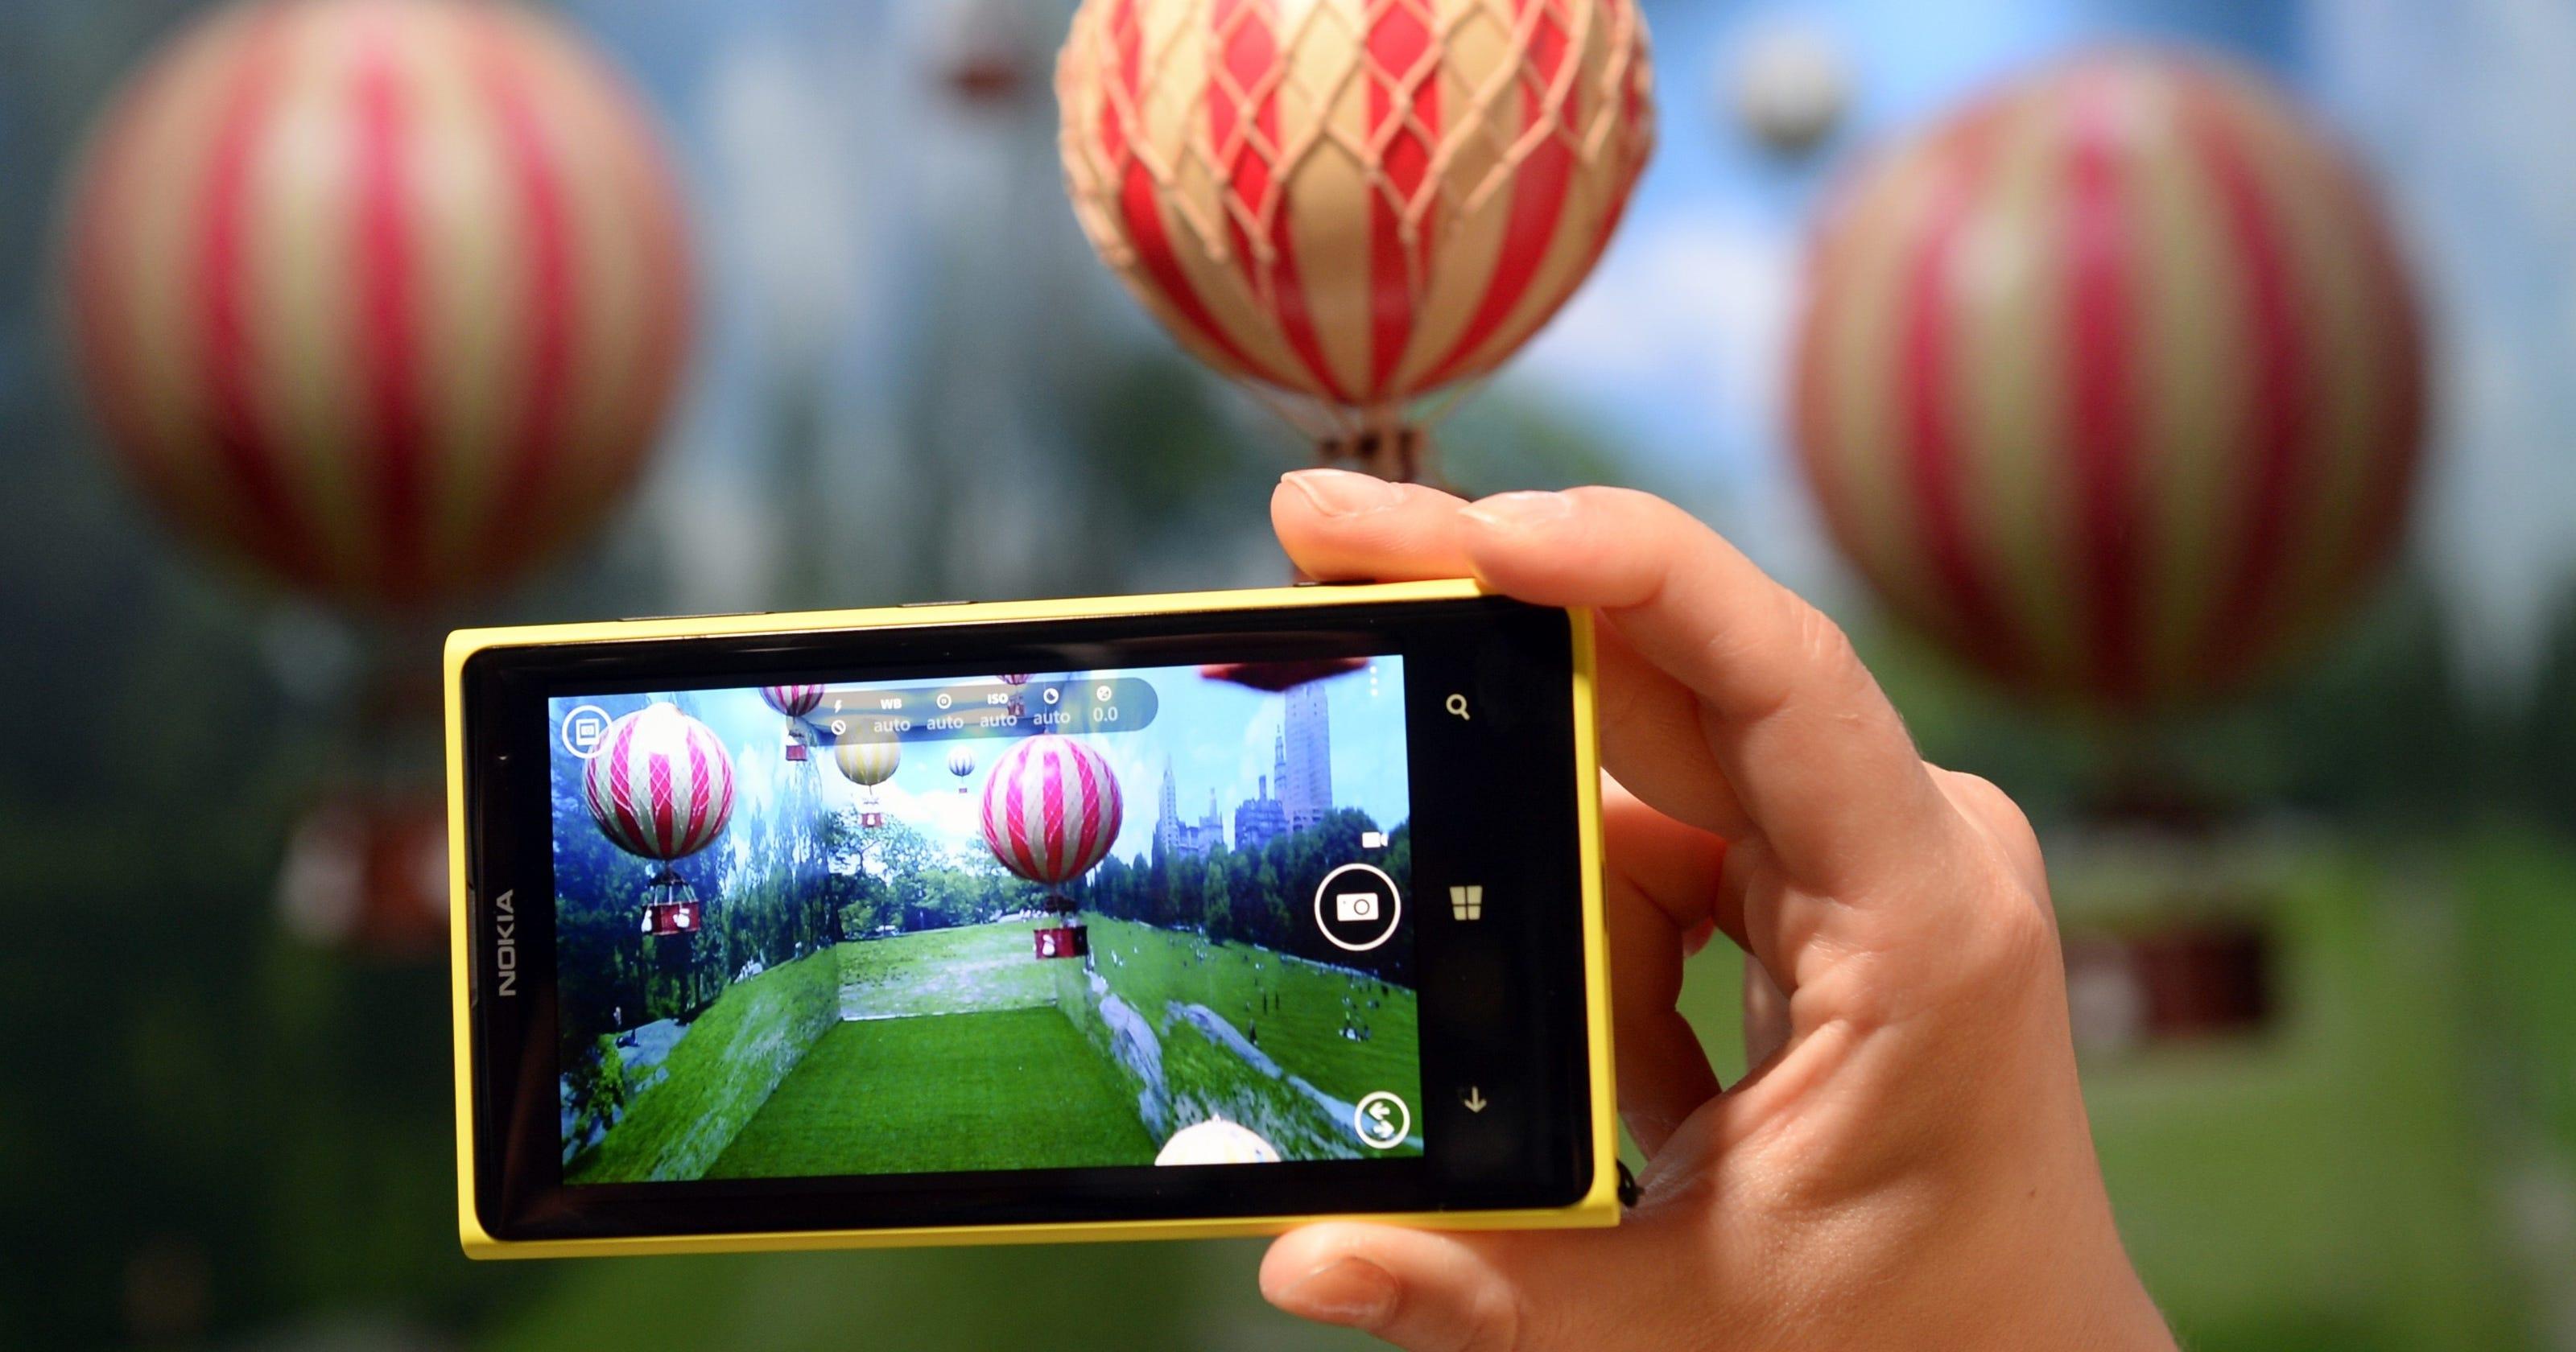 Nokia unveils Lumia 1020 phone with 41-megapixel camera